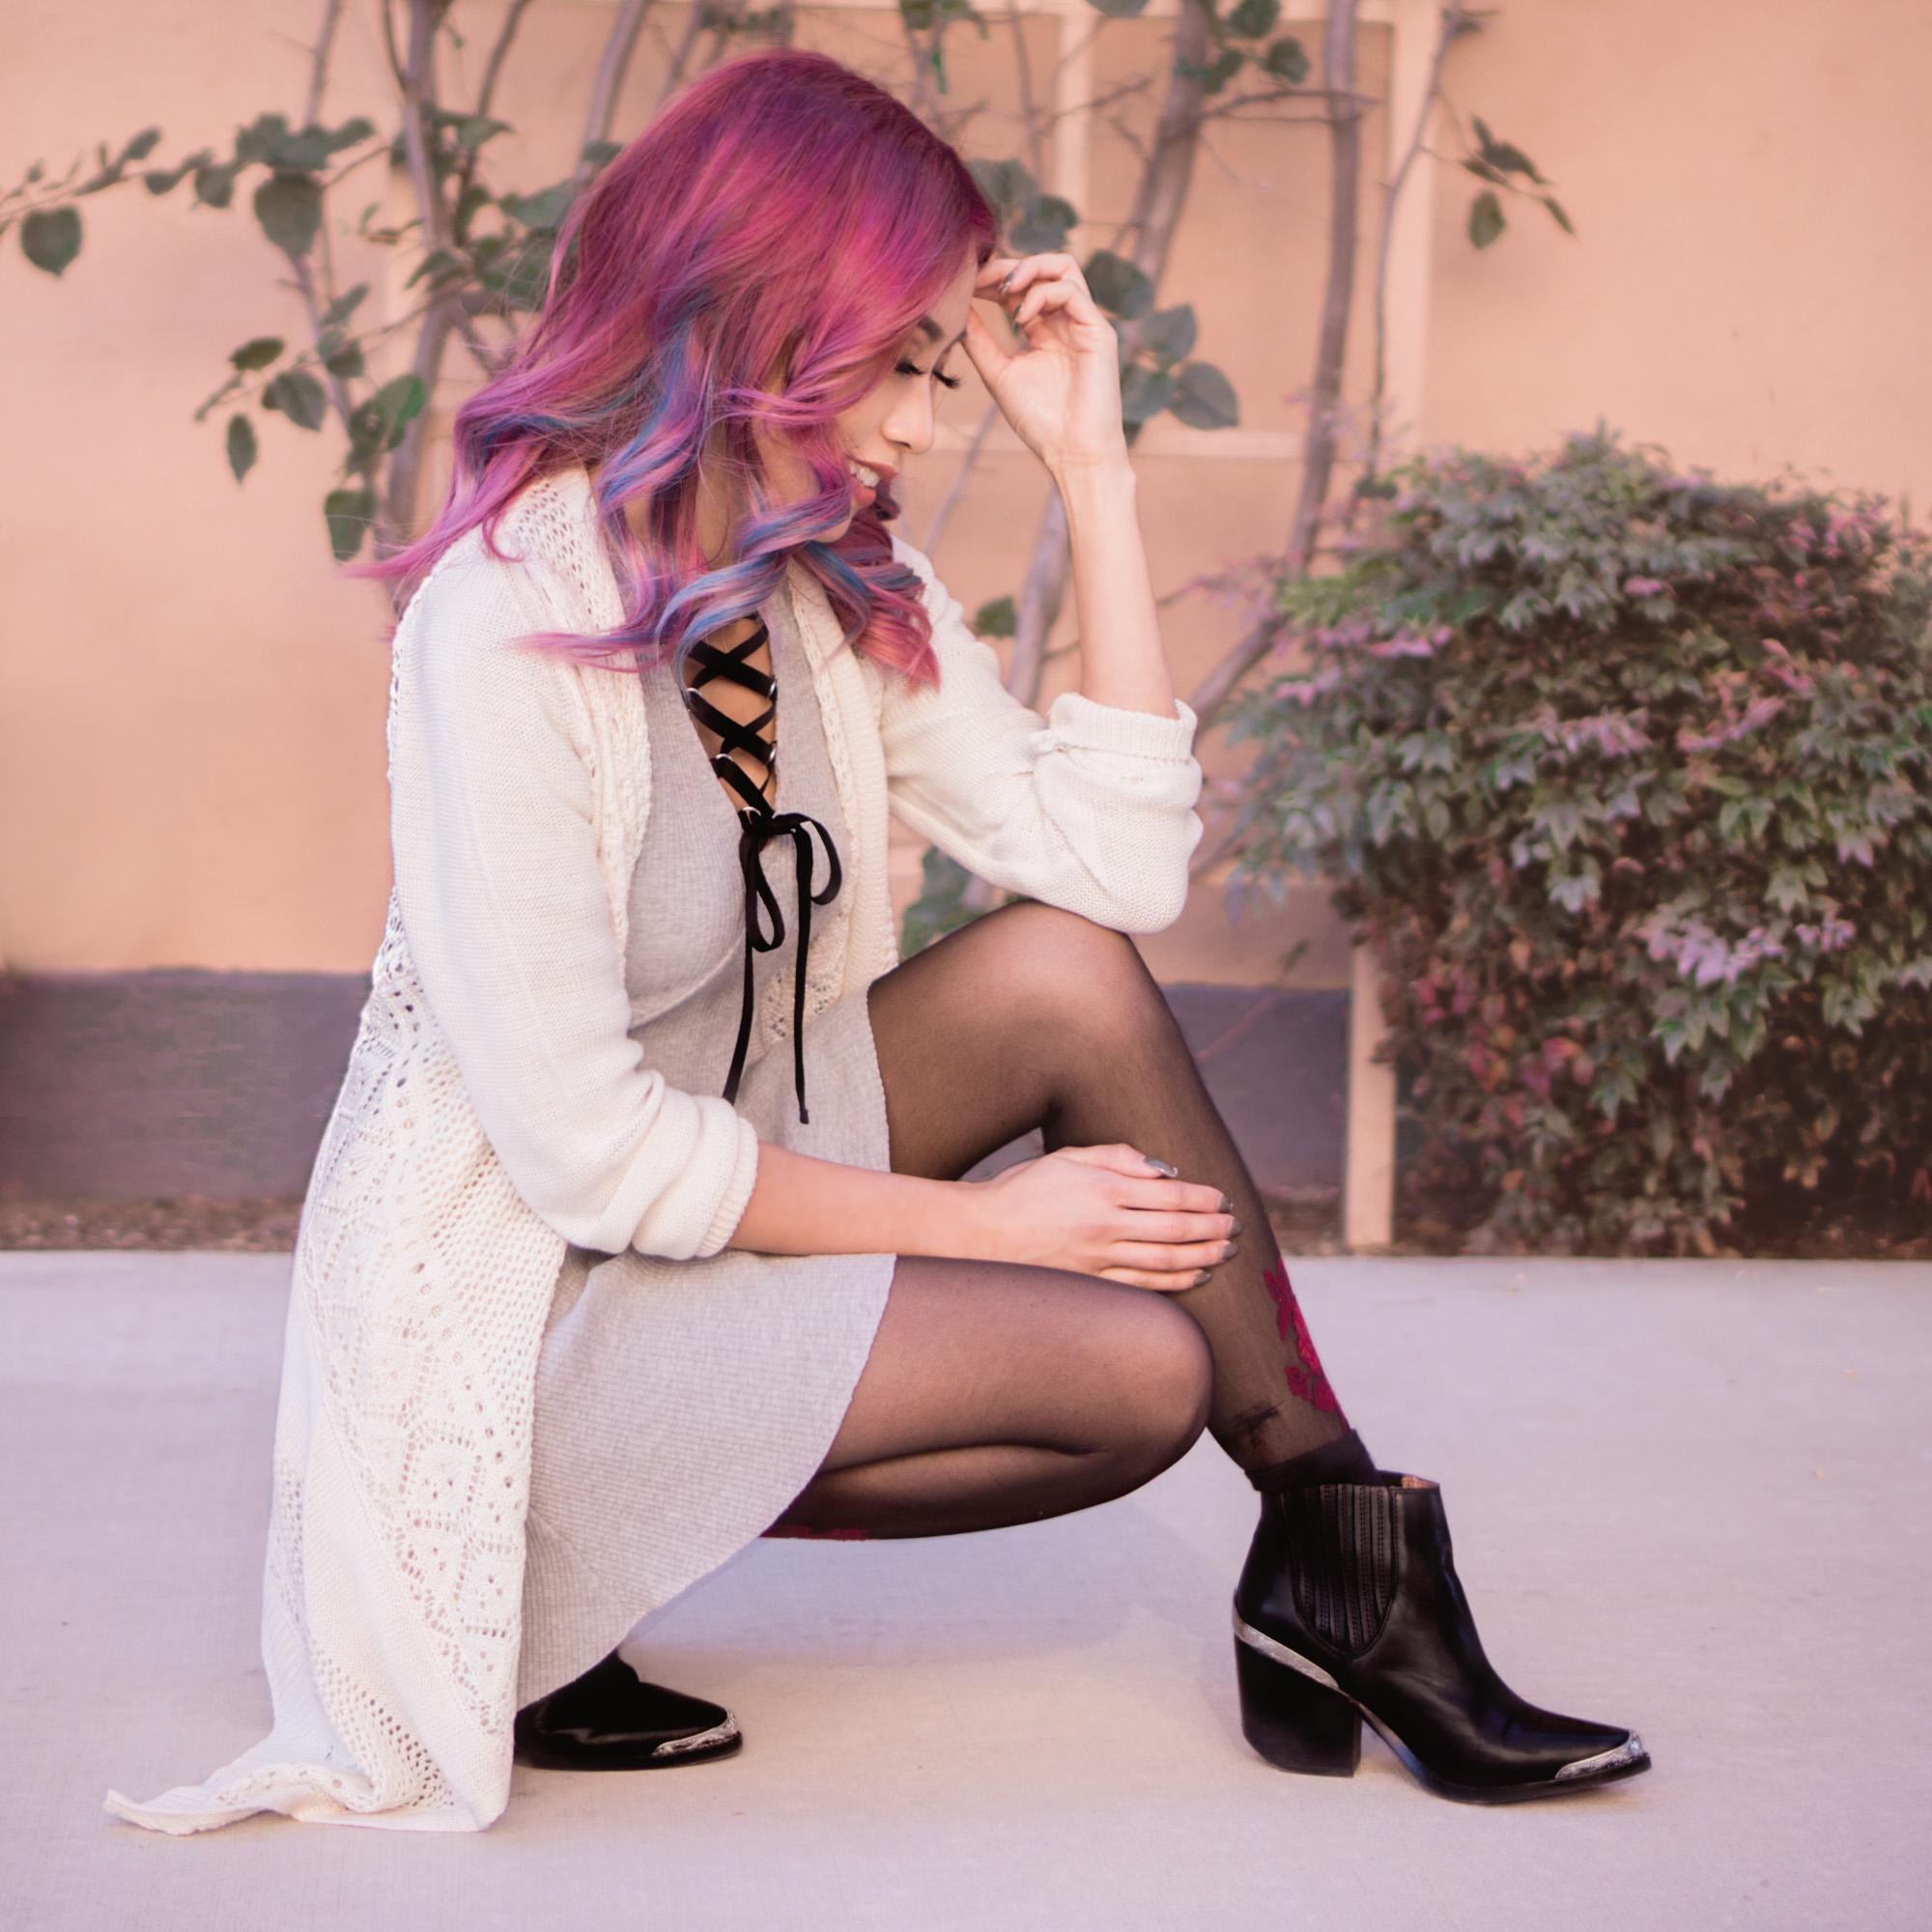 Dress : Grey Lace Up V Neck 3/4 sleeve A Line Dress    Shoes : Cromwell